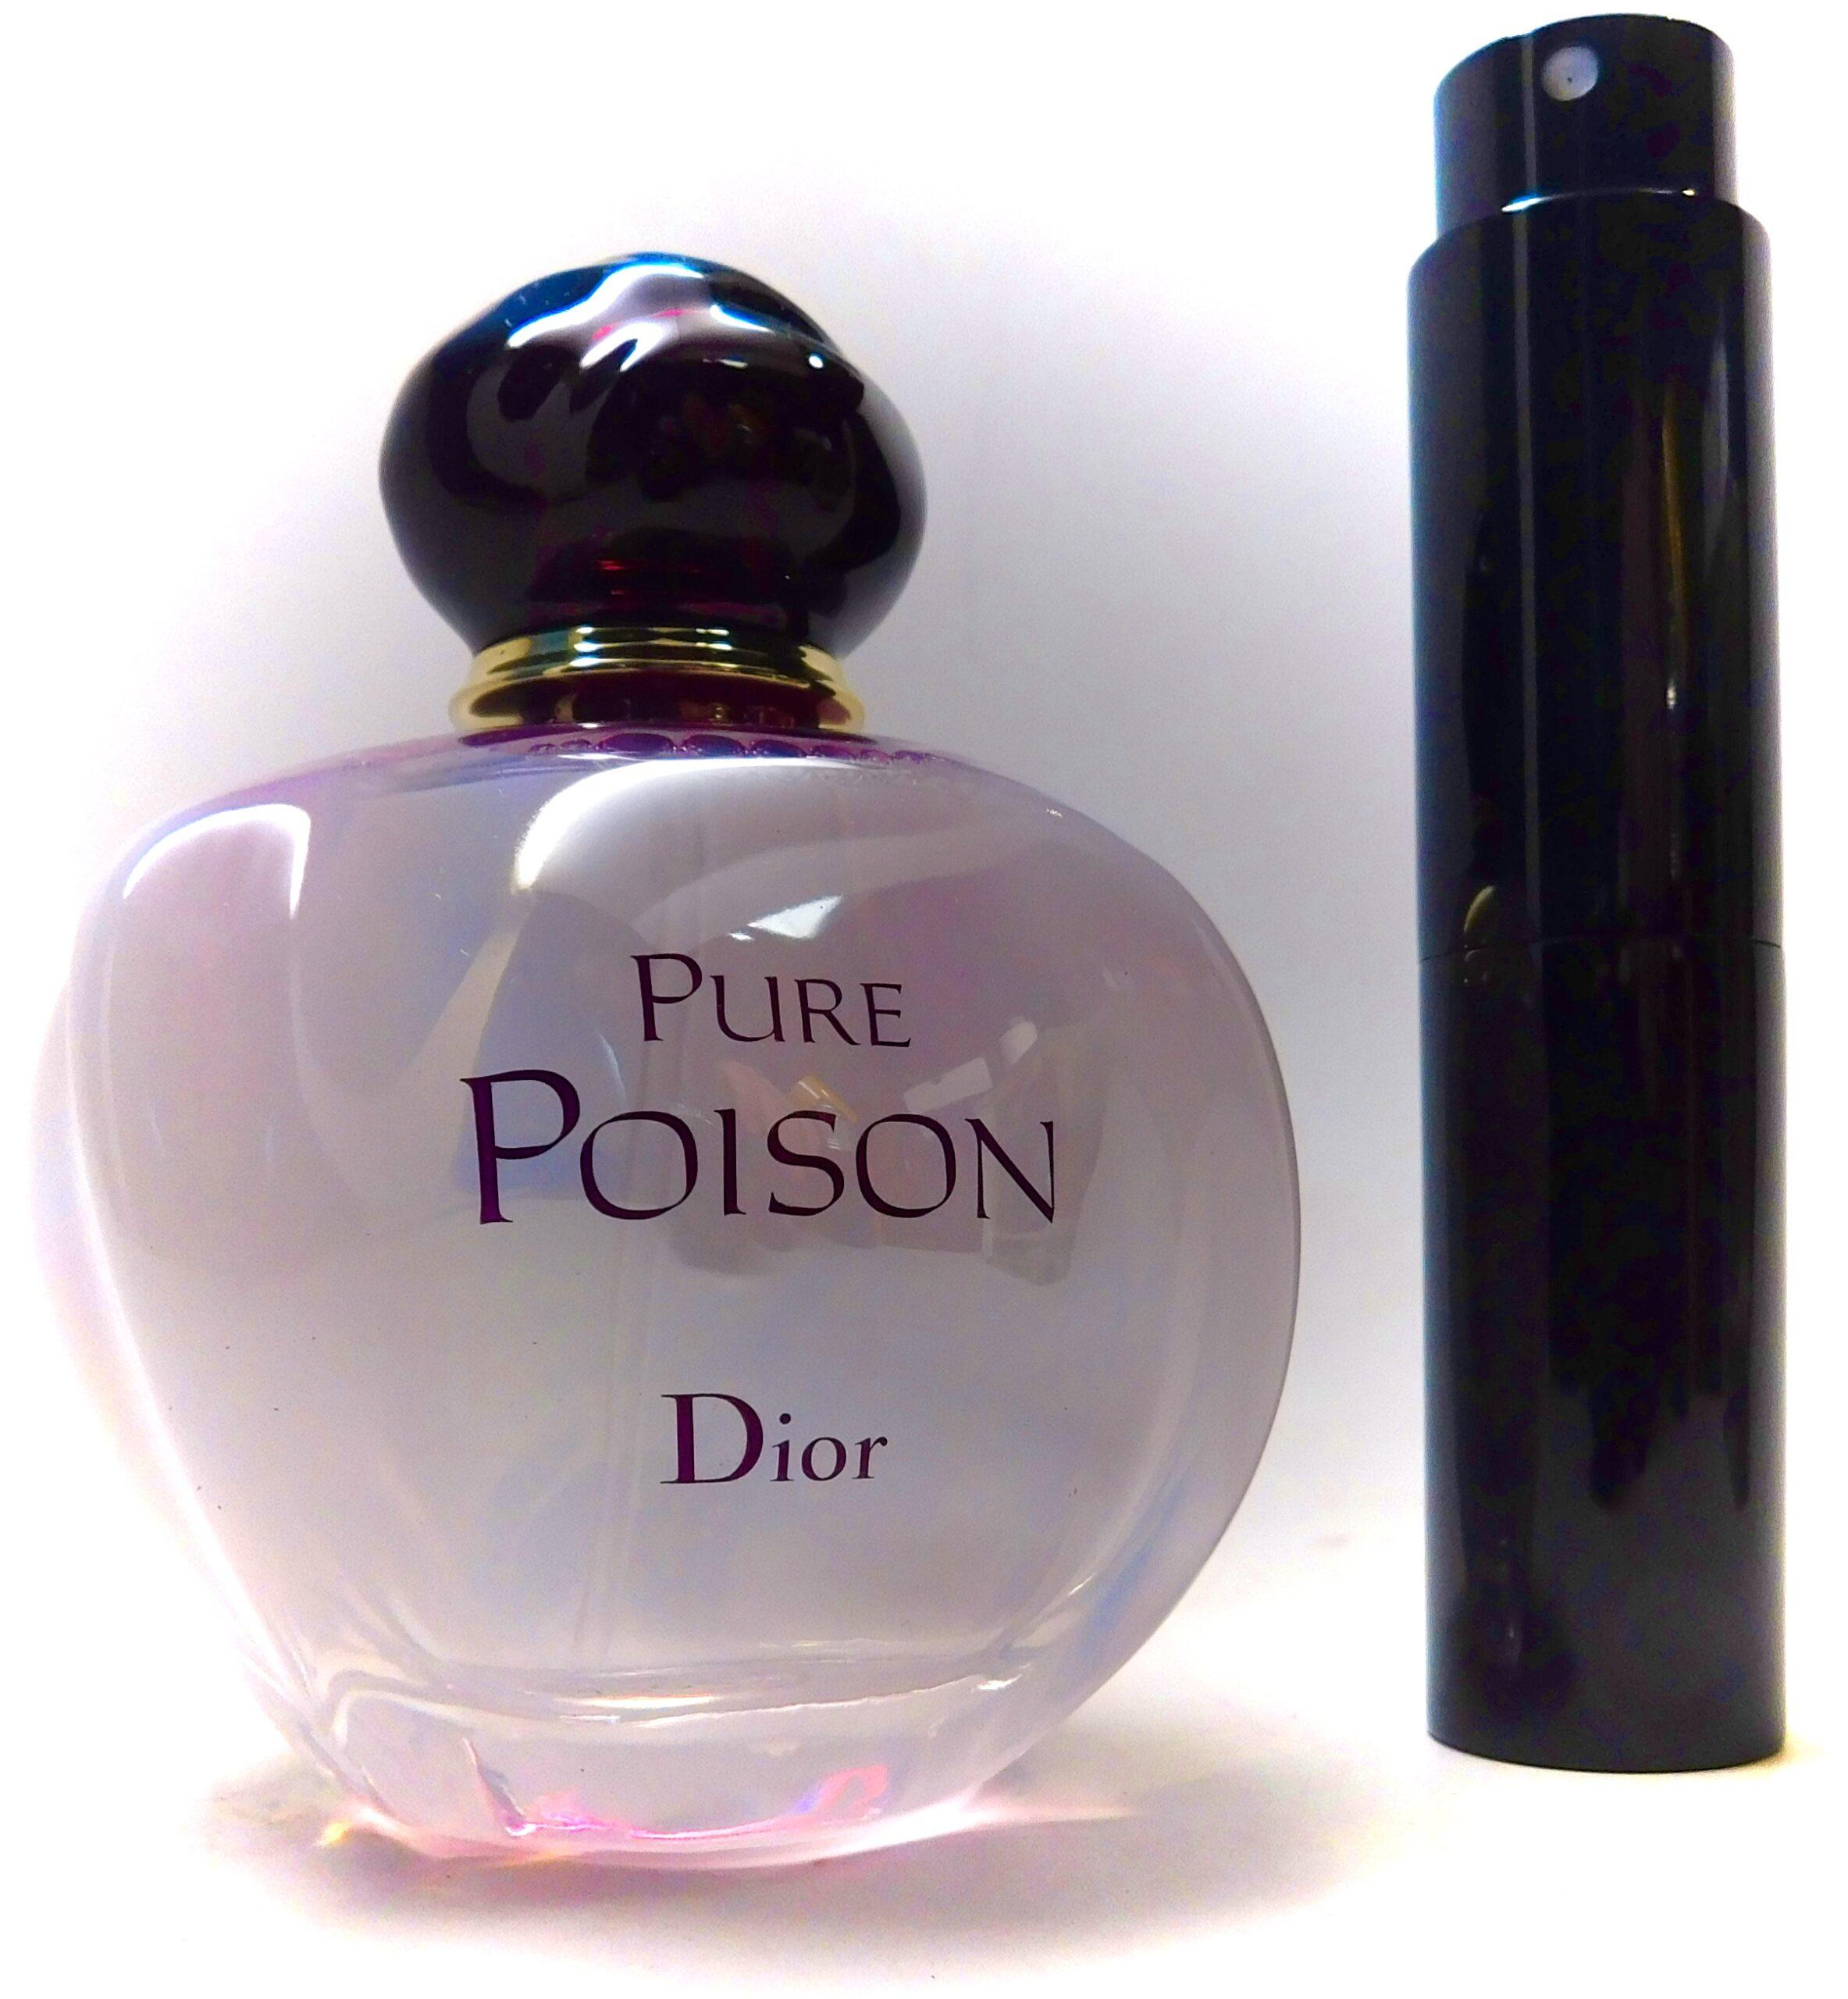 Christian Dior Pure Poison Parfum 8ml Travel Atomizer Floral